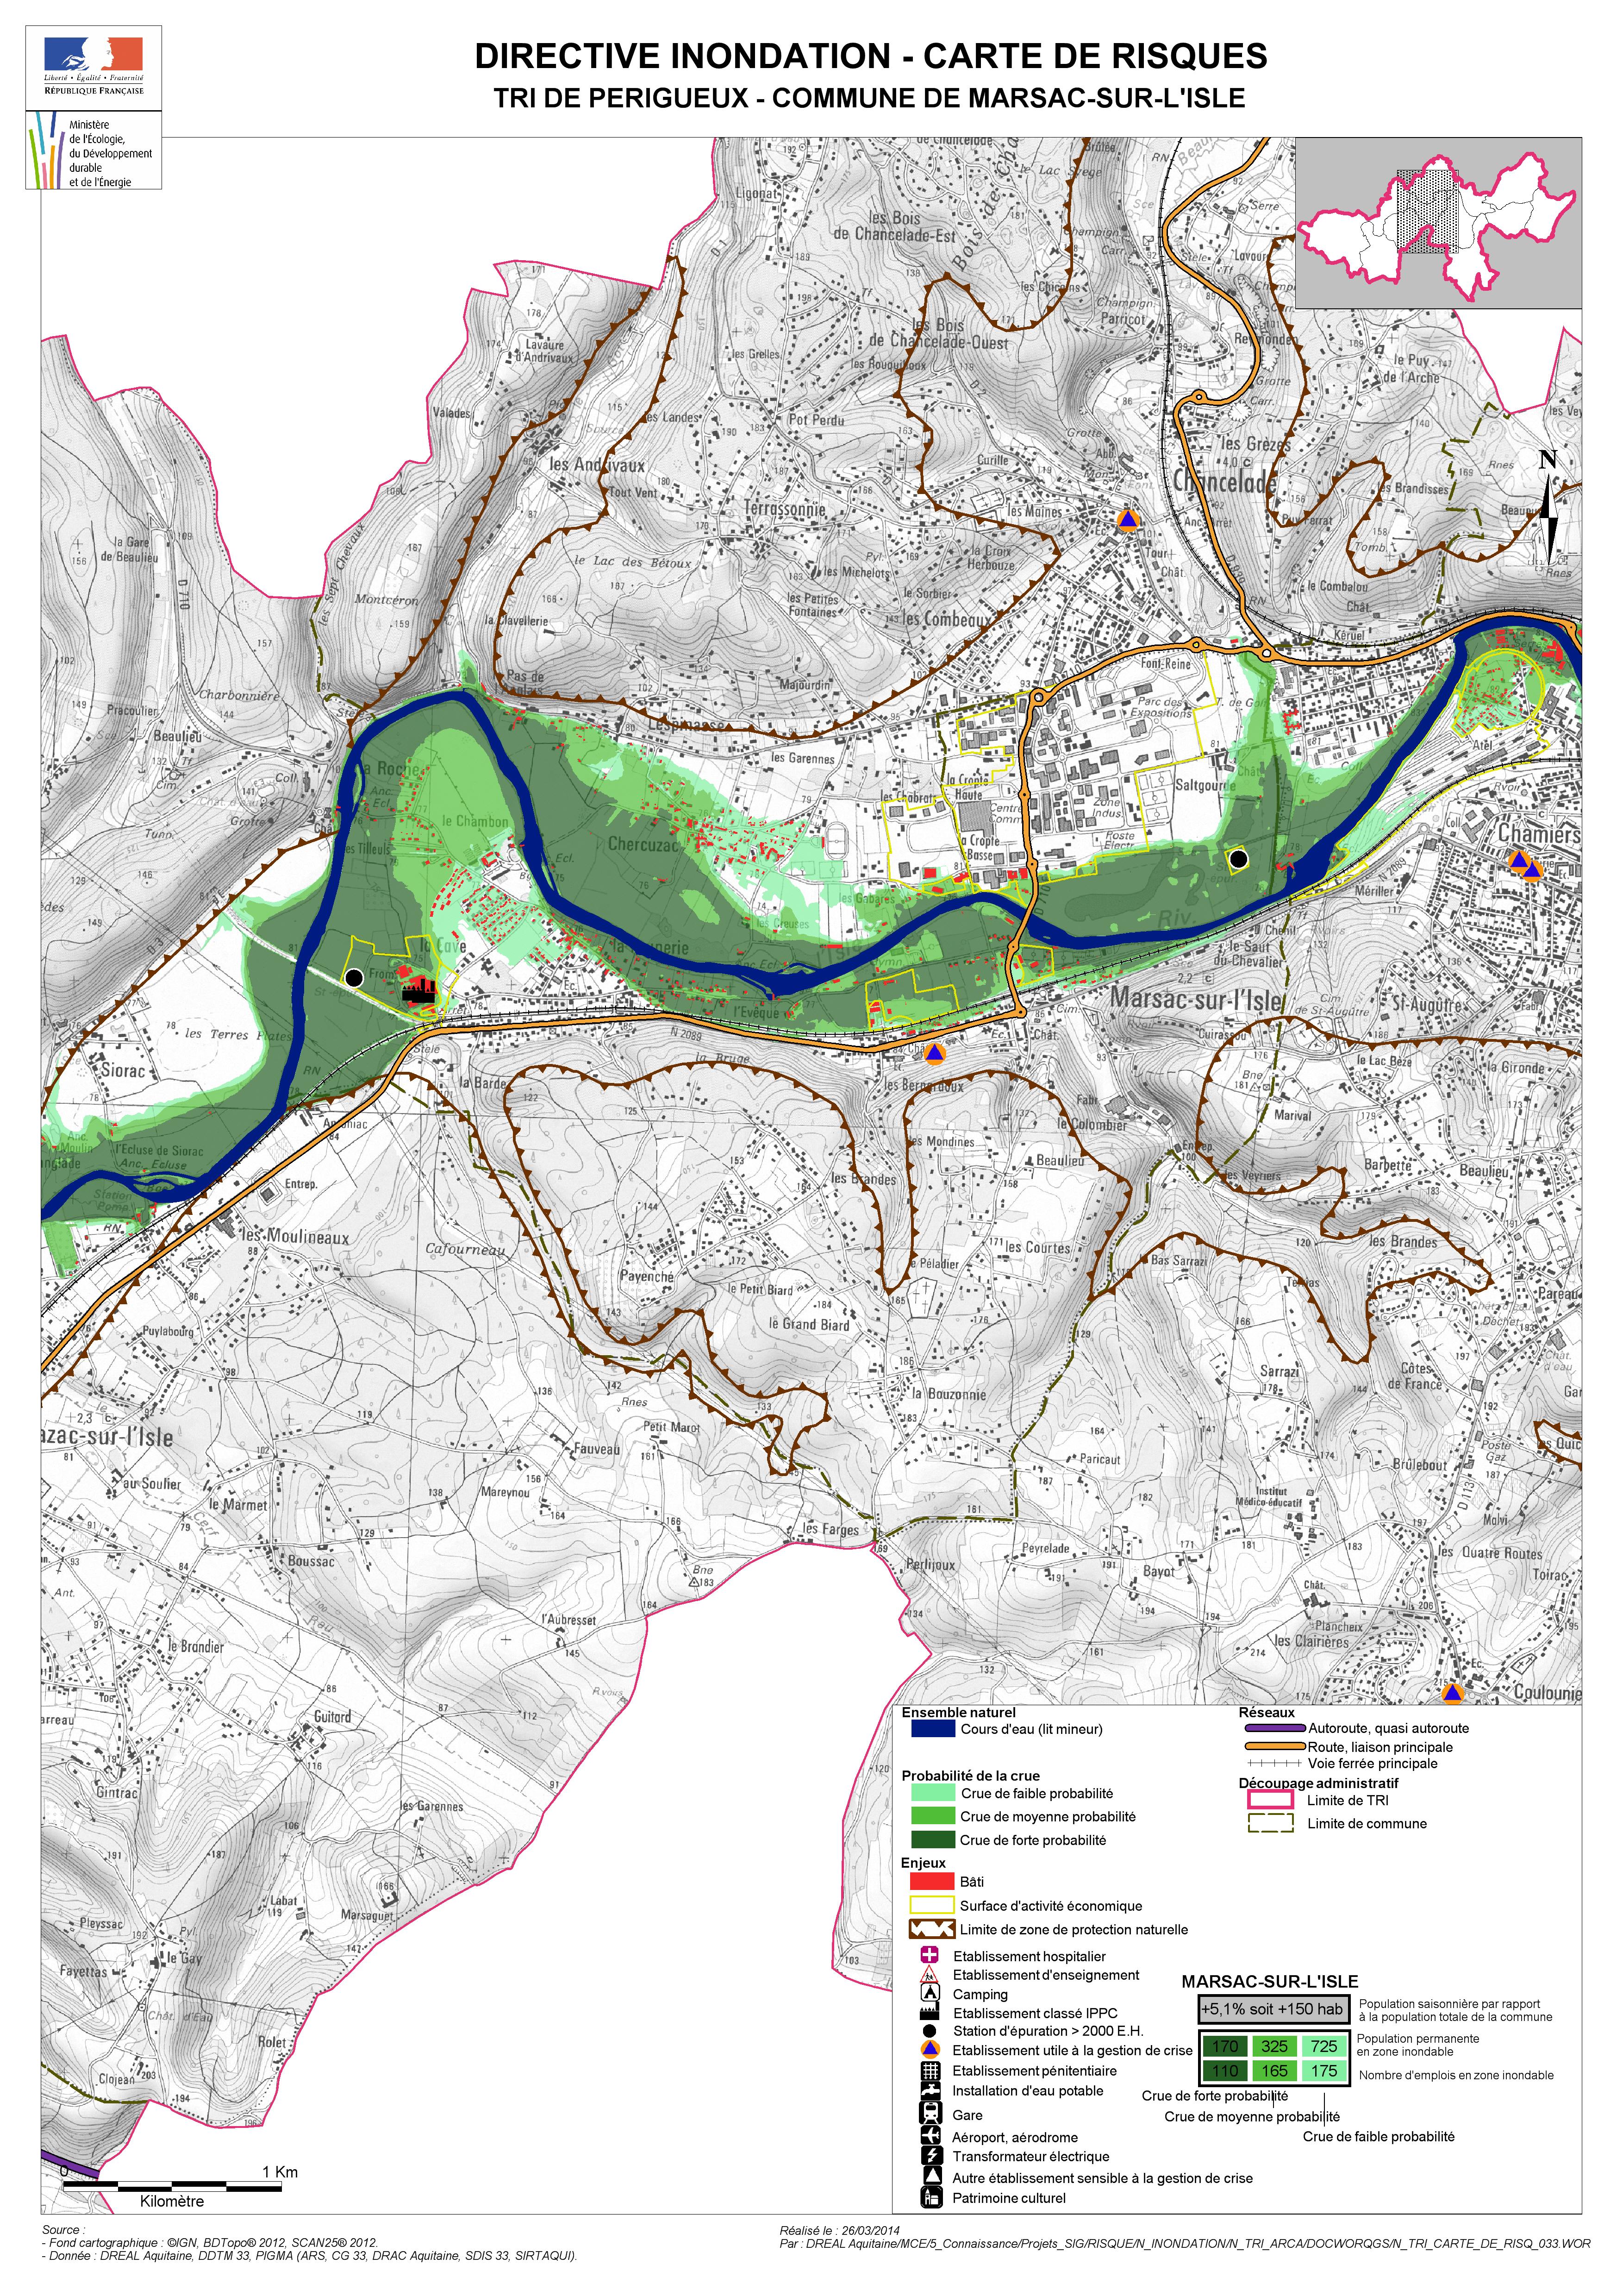 cartographie des territoires risques importants d 39 inondation tri territoires risques. Black Bedroom Furniture Sets. Home Design Ideas